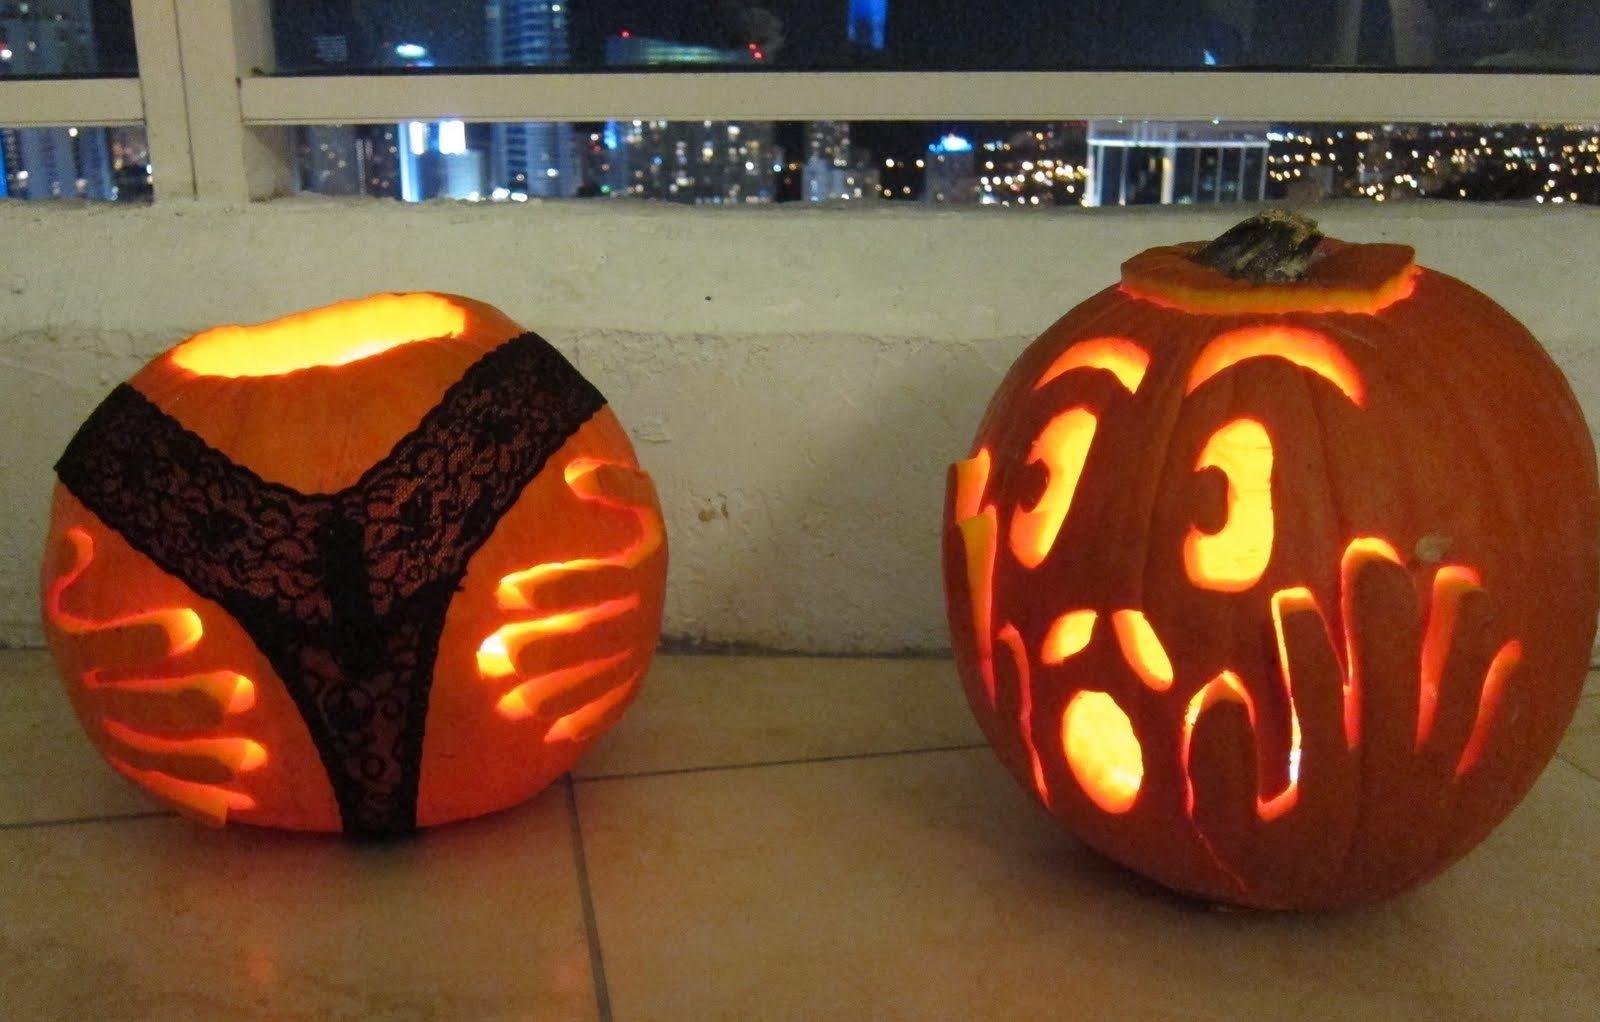 10 Famous Pumpkin Carving Ideas For Girls ideas girl pumpkin carving ideas 2020